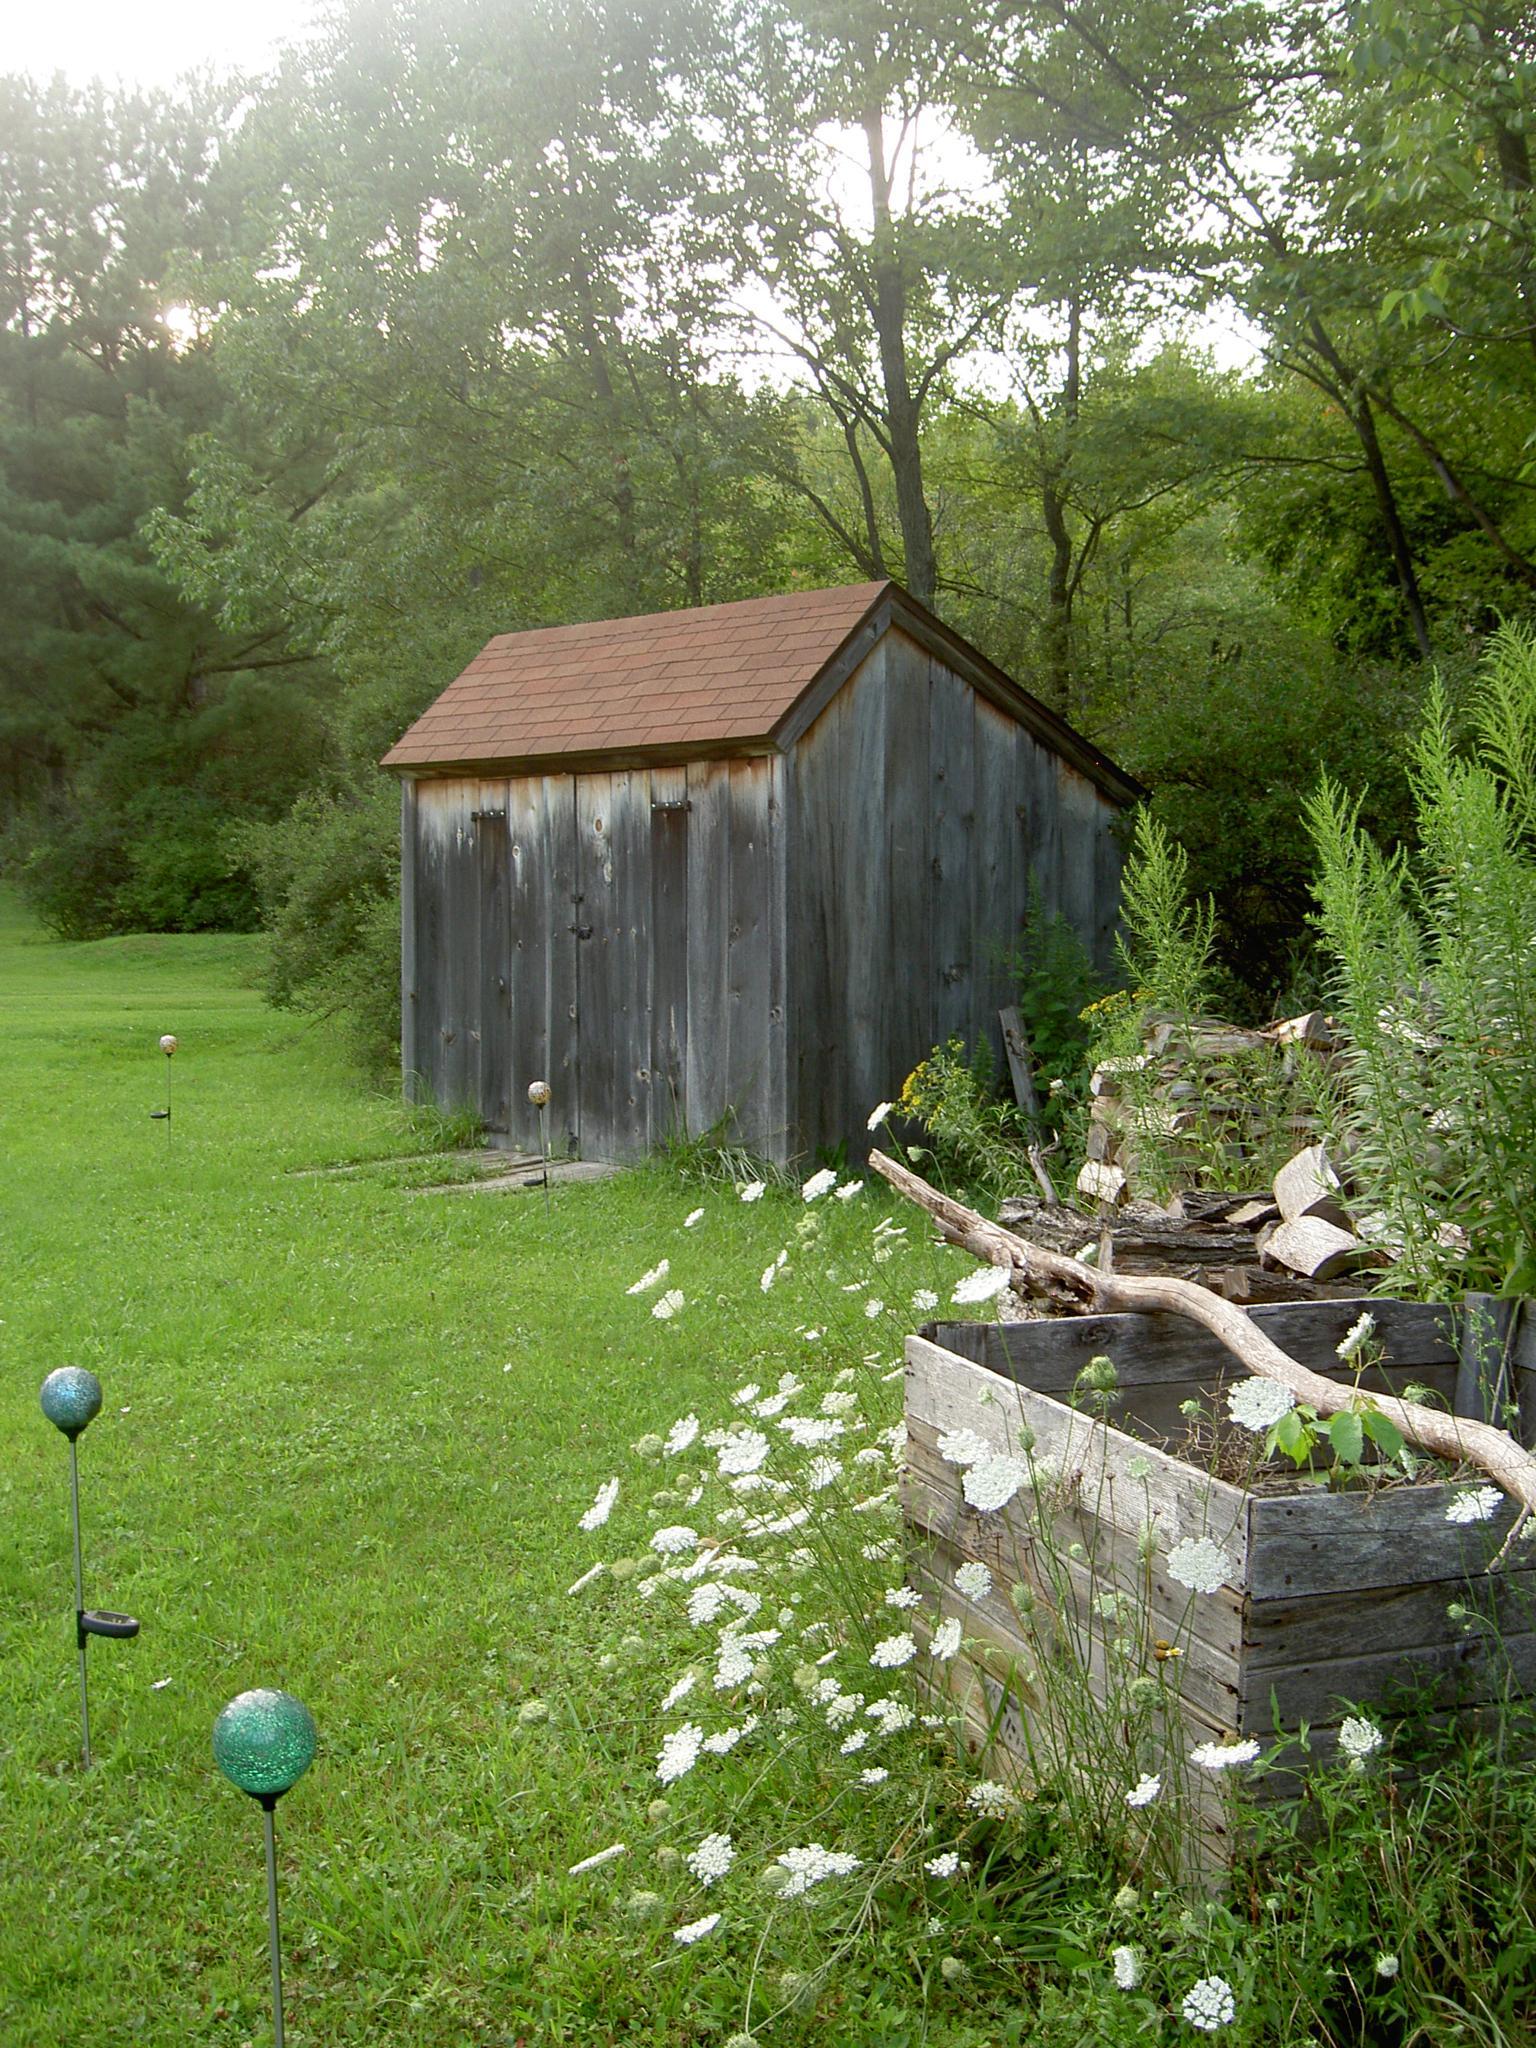 Garden Shed by Terri Scache Harris